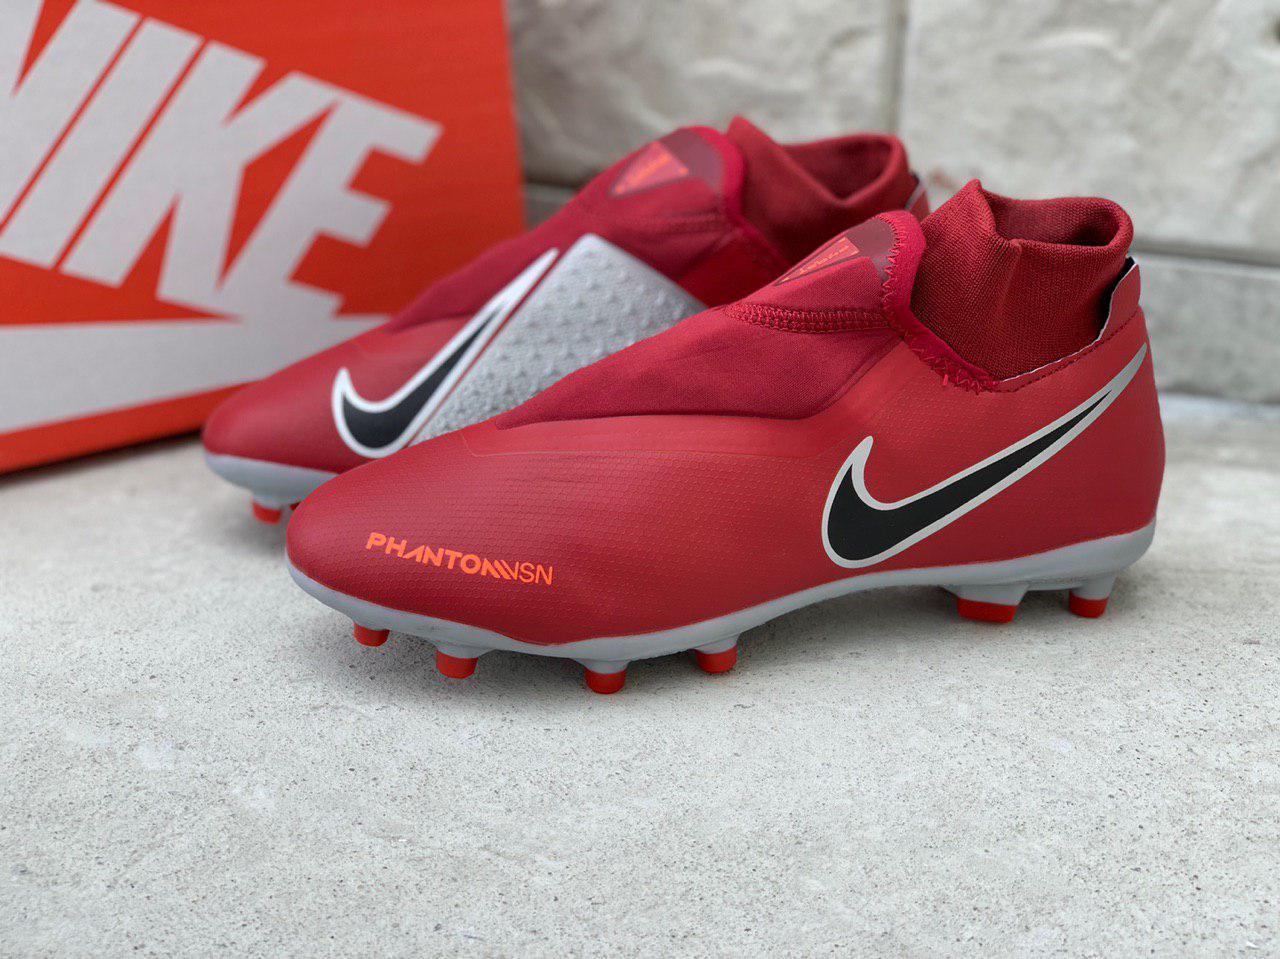 da20a4bf Бутсы Nike Phantom VSN FG / футбольная обувь /найк фантом: продажа ...